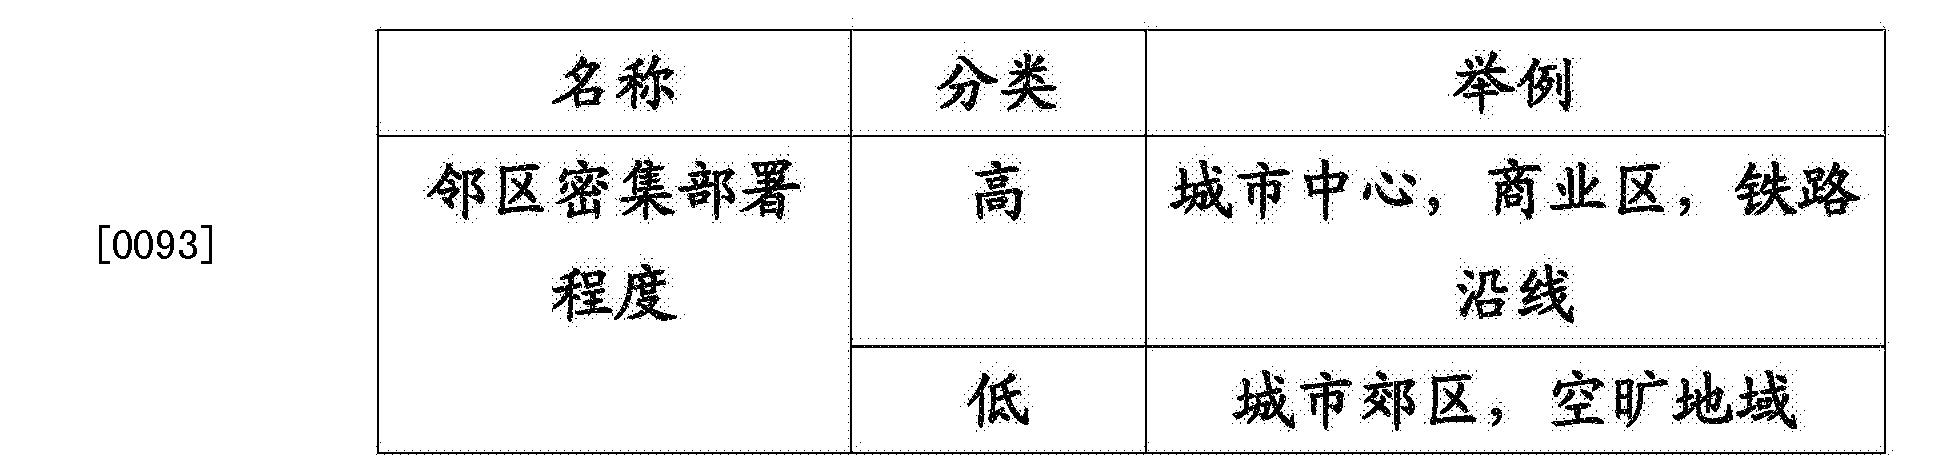 Figure CN105101046AD00141